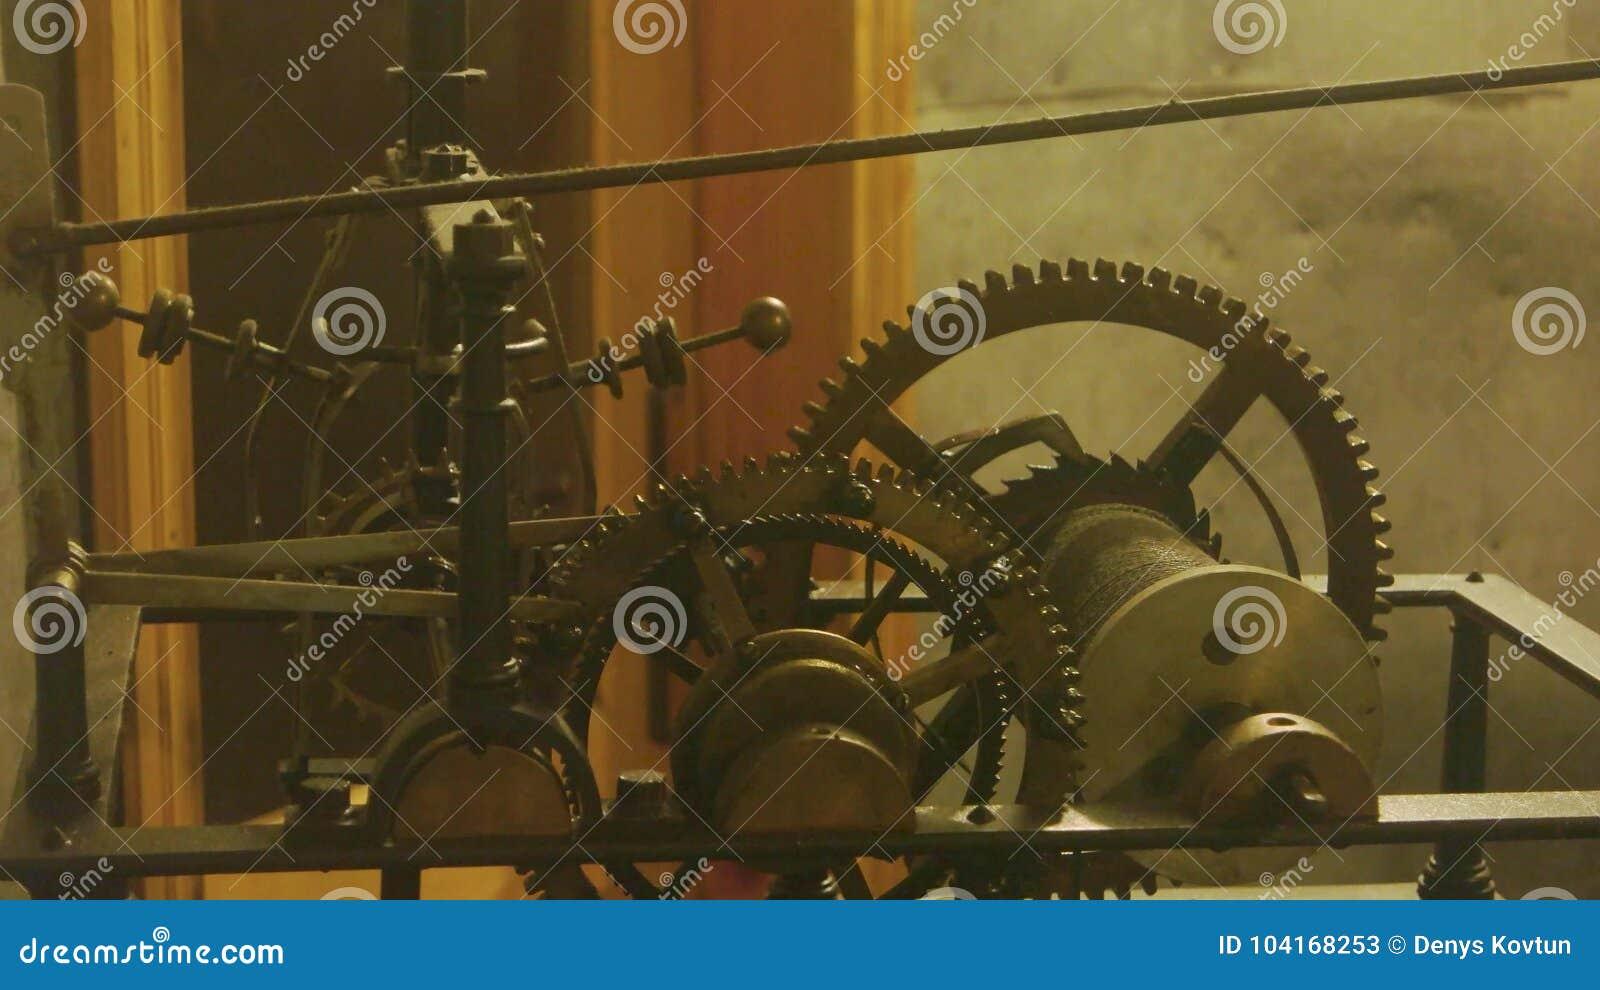 Mechanism of an old clock